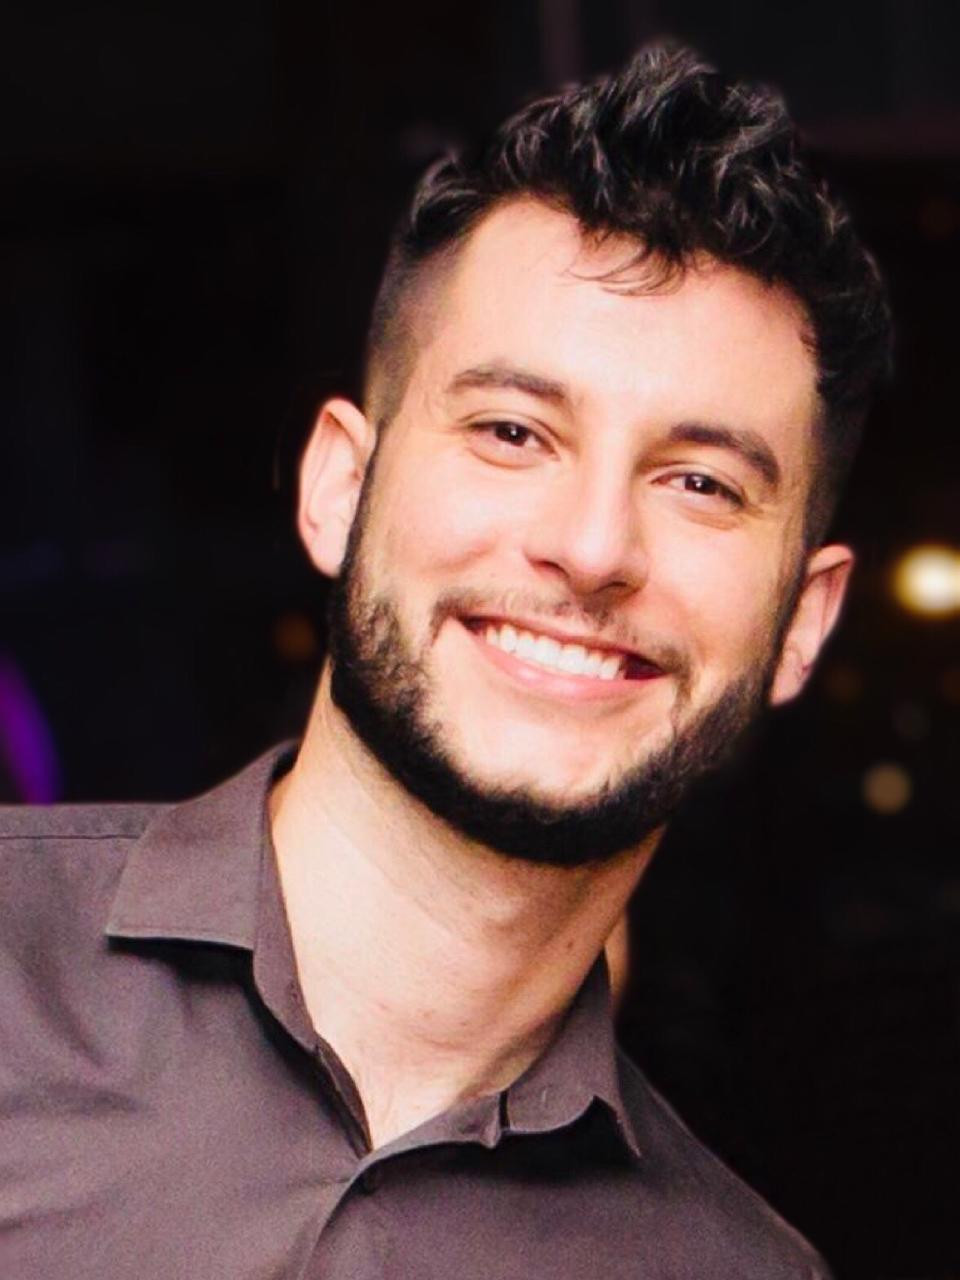 Felipe Saraiva